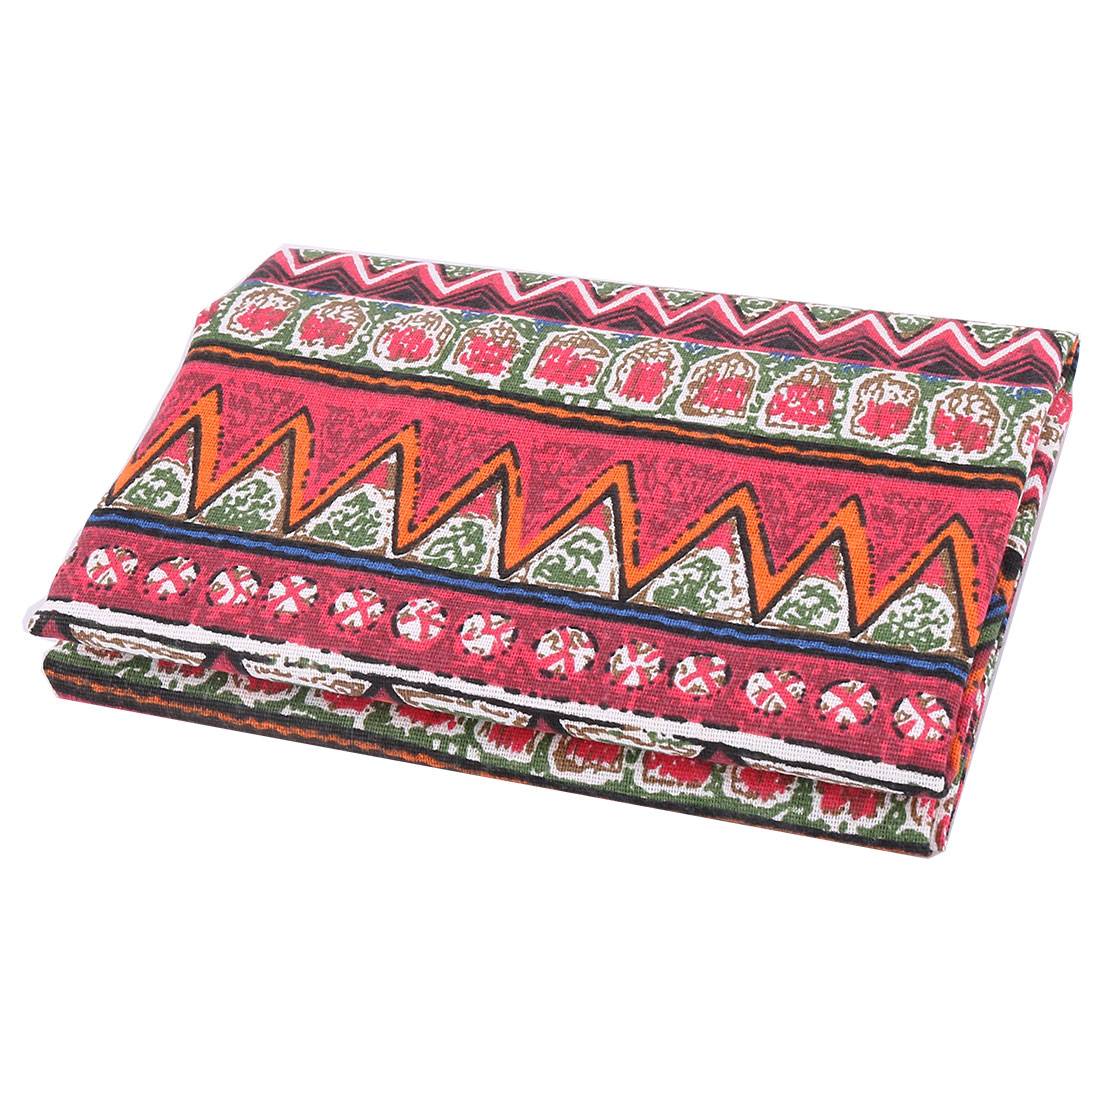 Unique BargainsHome Linen Geometric Print Table Sofa Cover Curtain Bag DIY Fabric 1.55M Length